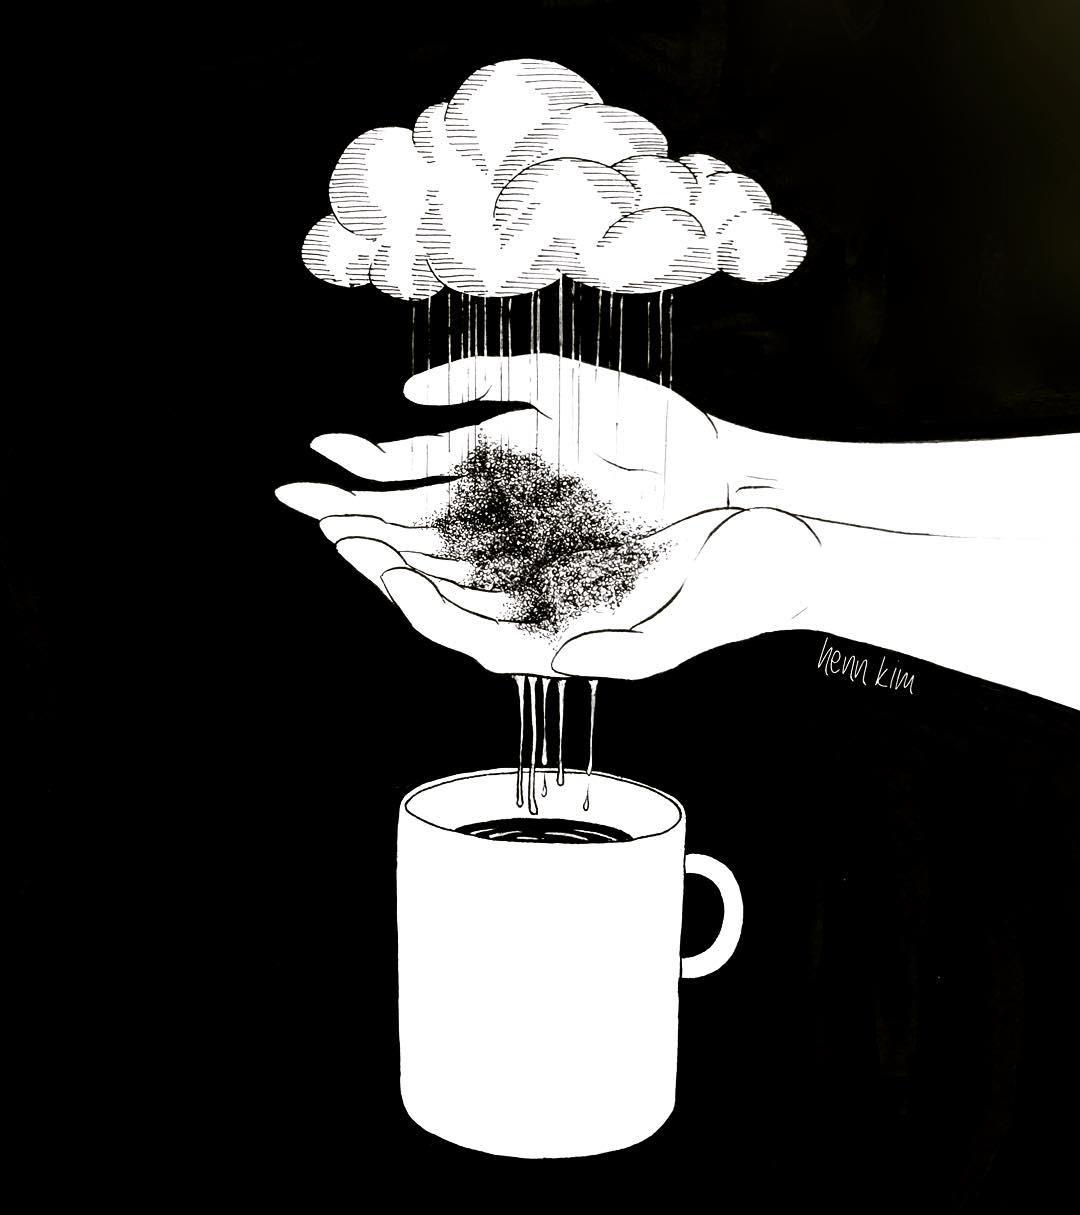 Henn Kim illustration 16